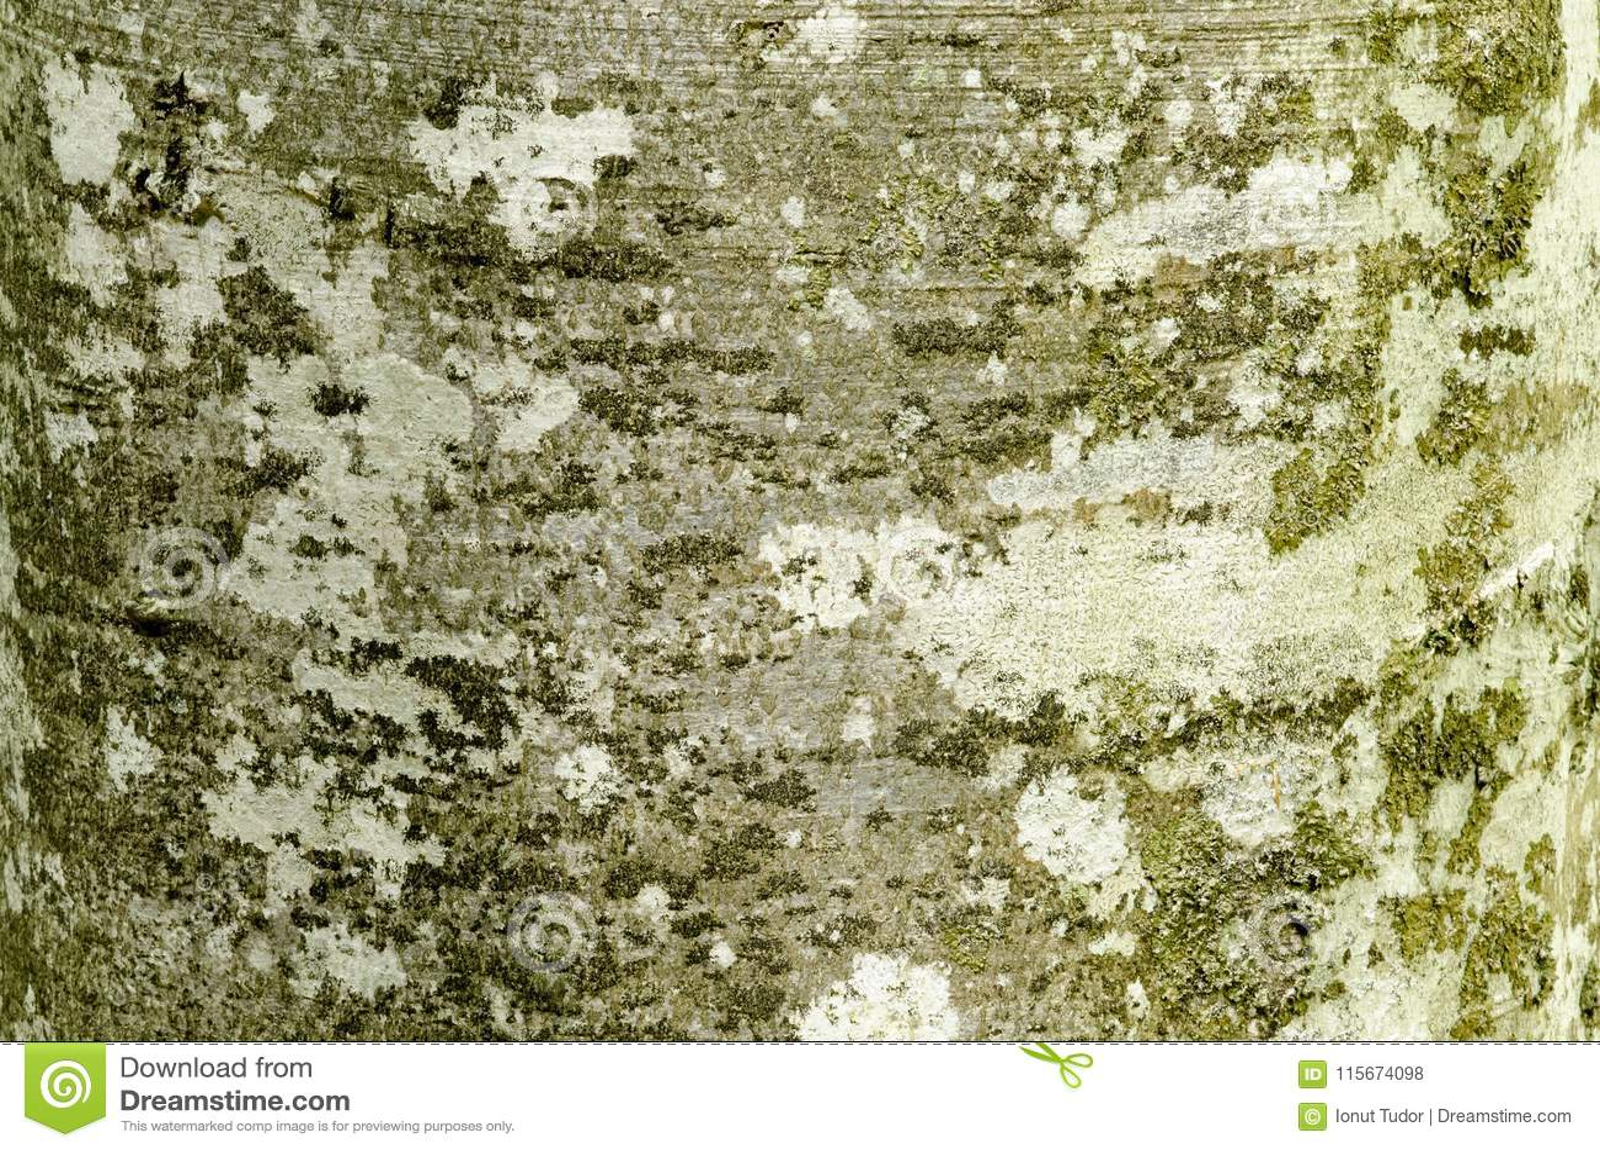 Beech tree bark with textured pattern